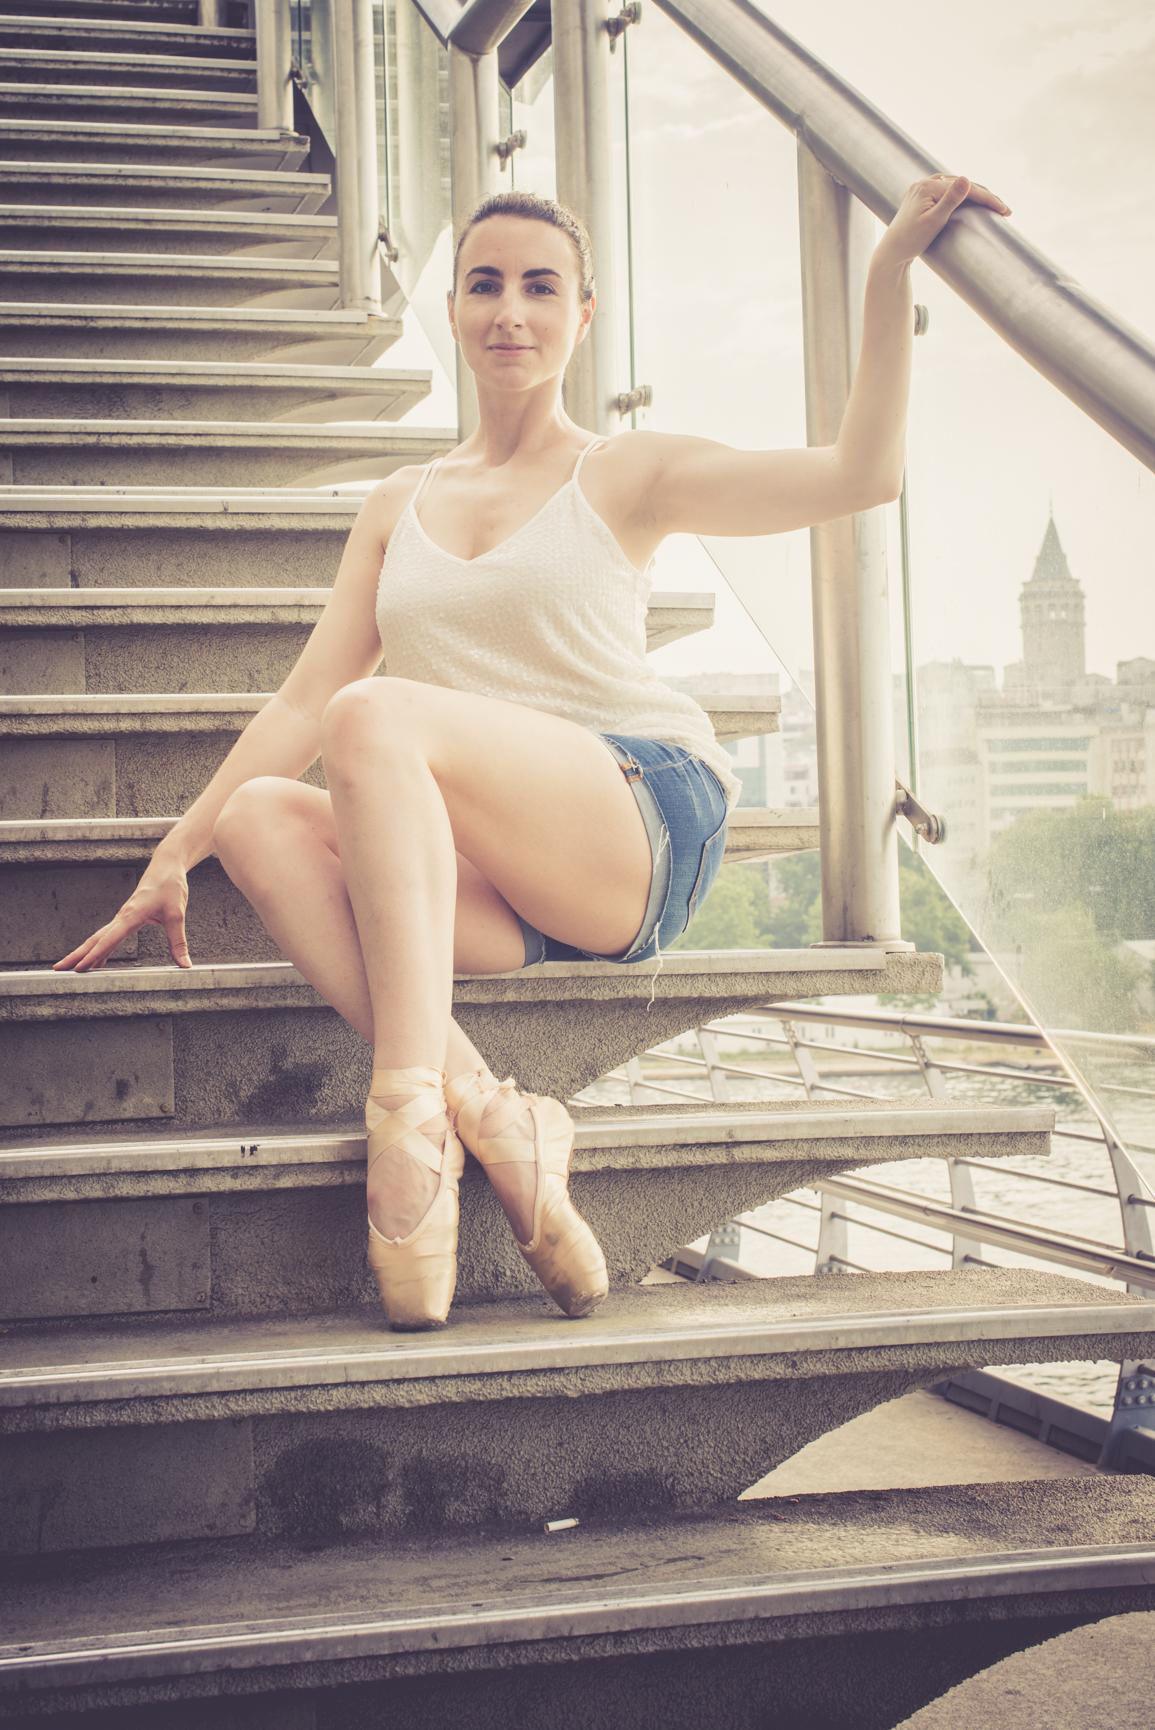 Caro_Ballerina-173.jpg